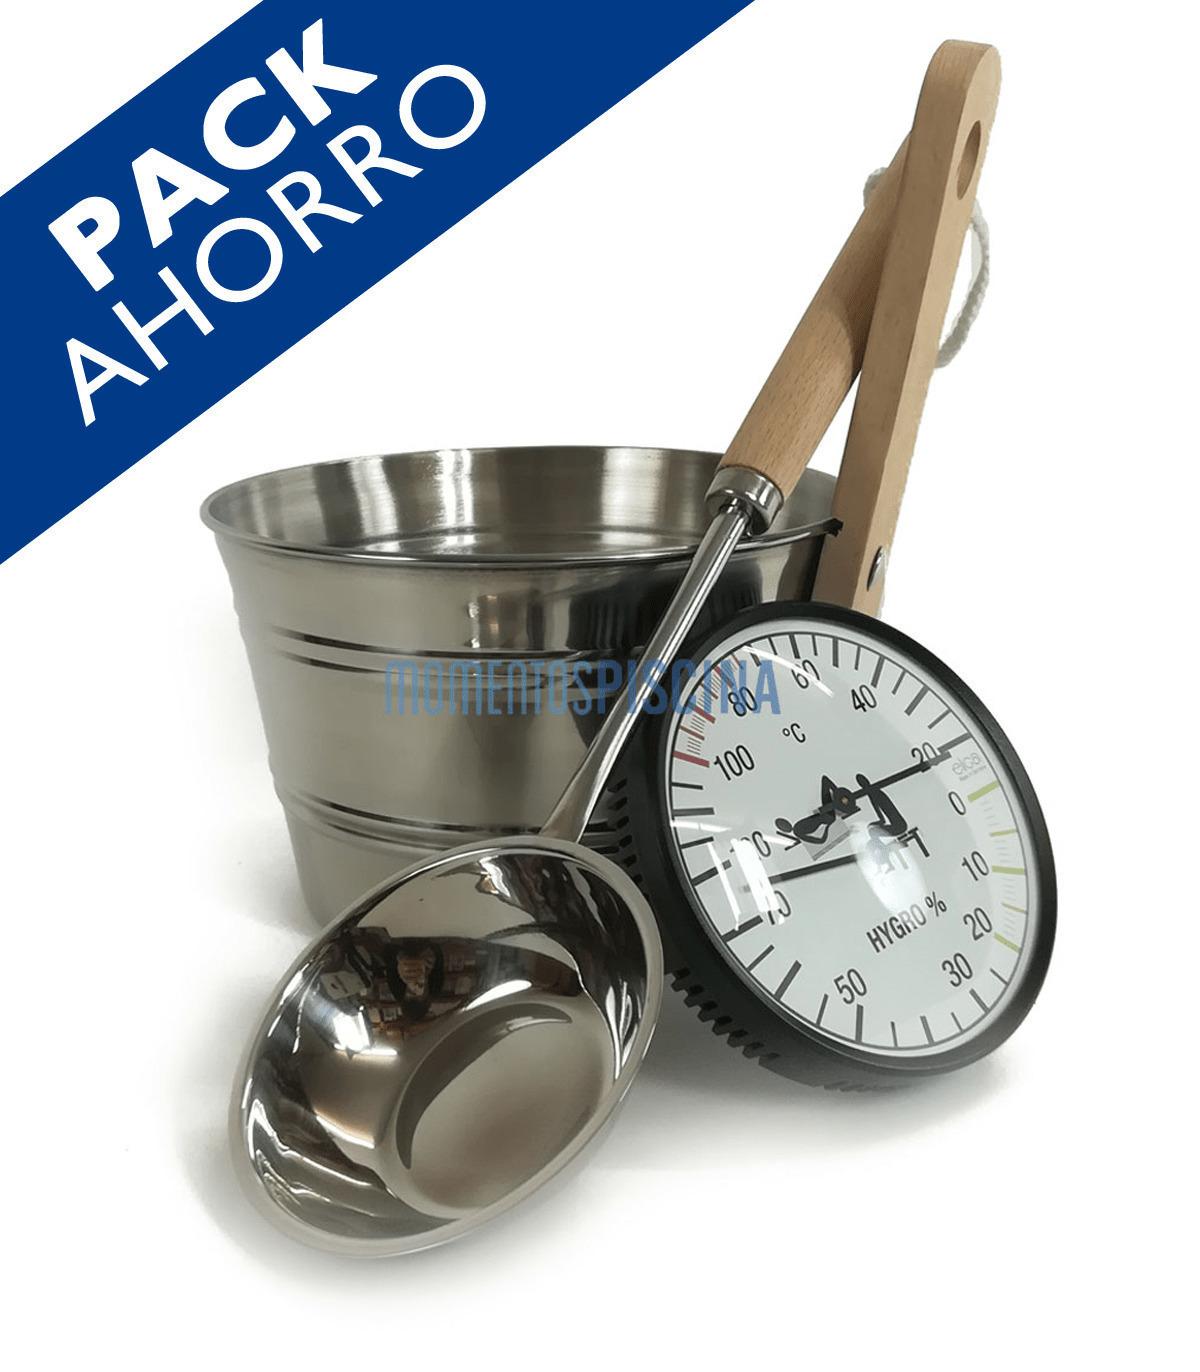 Prix D Un Sauna pack sauna inoxydable thermohygromètre | meilleur prix ✅